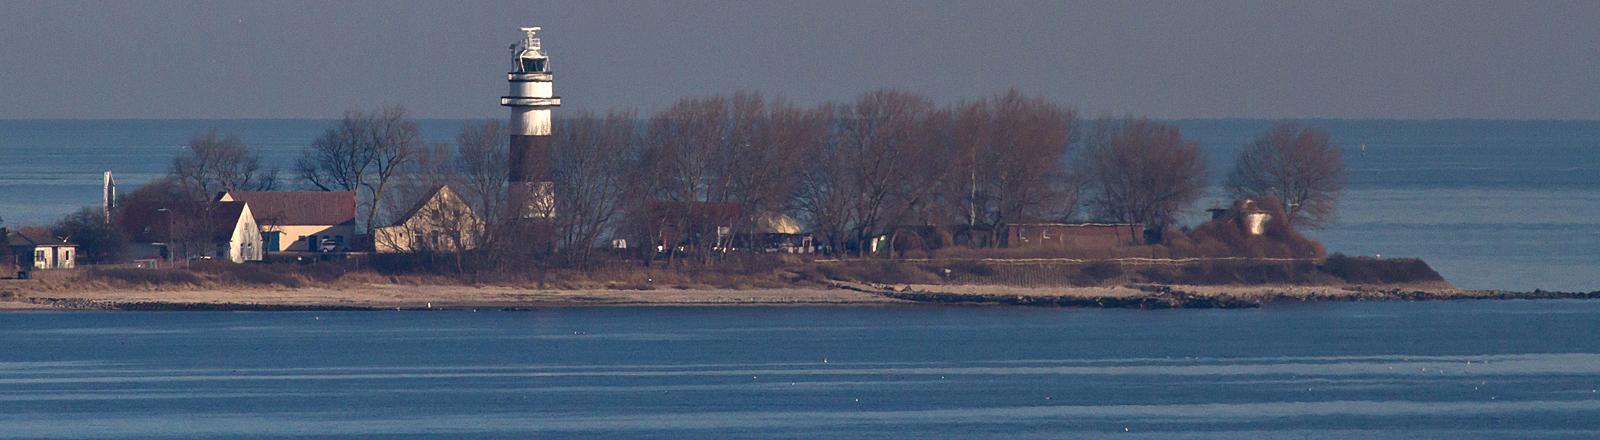 Bülker Leuchtturm an Kieler Förde